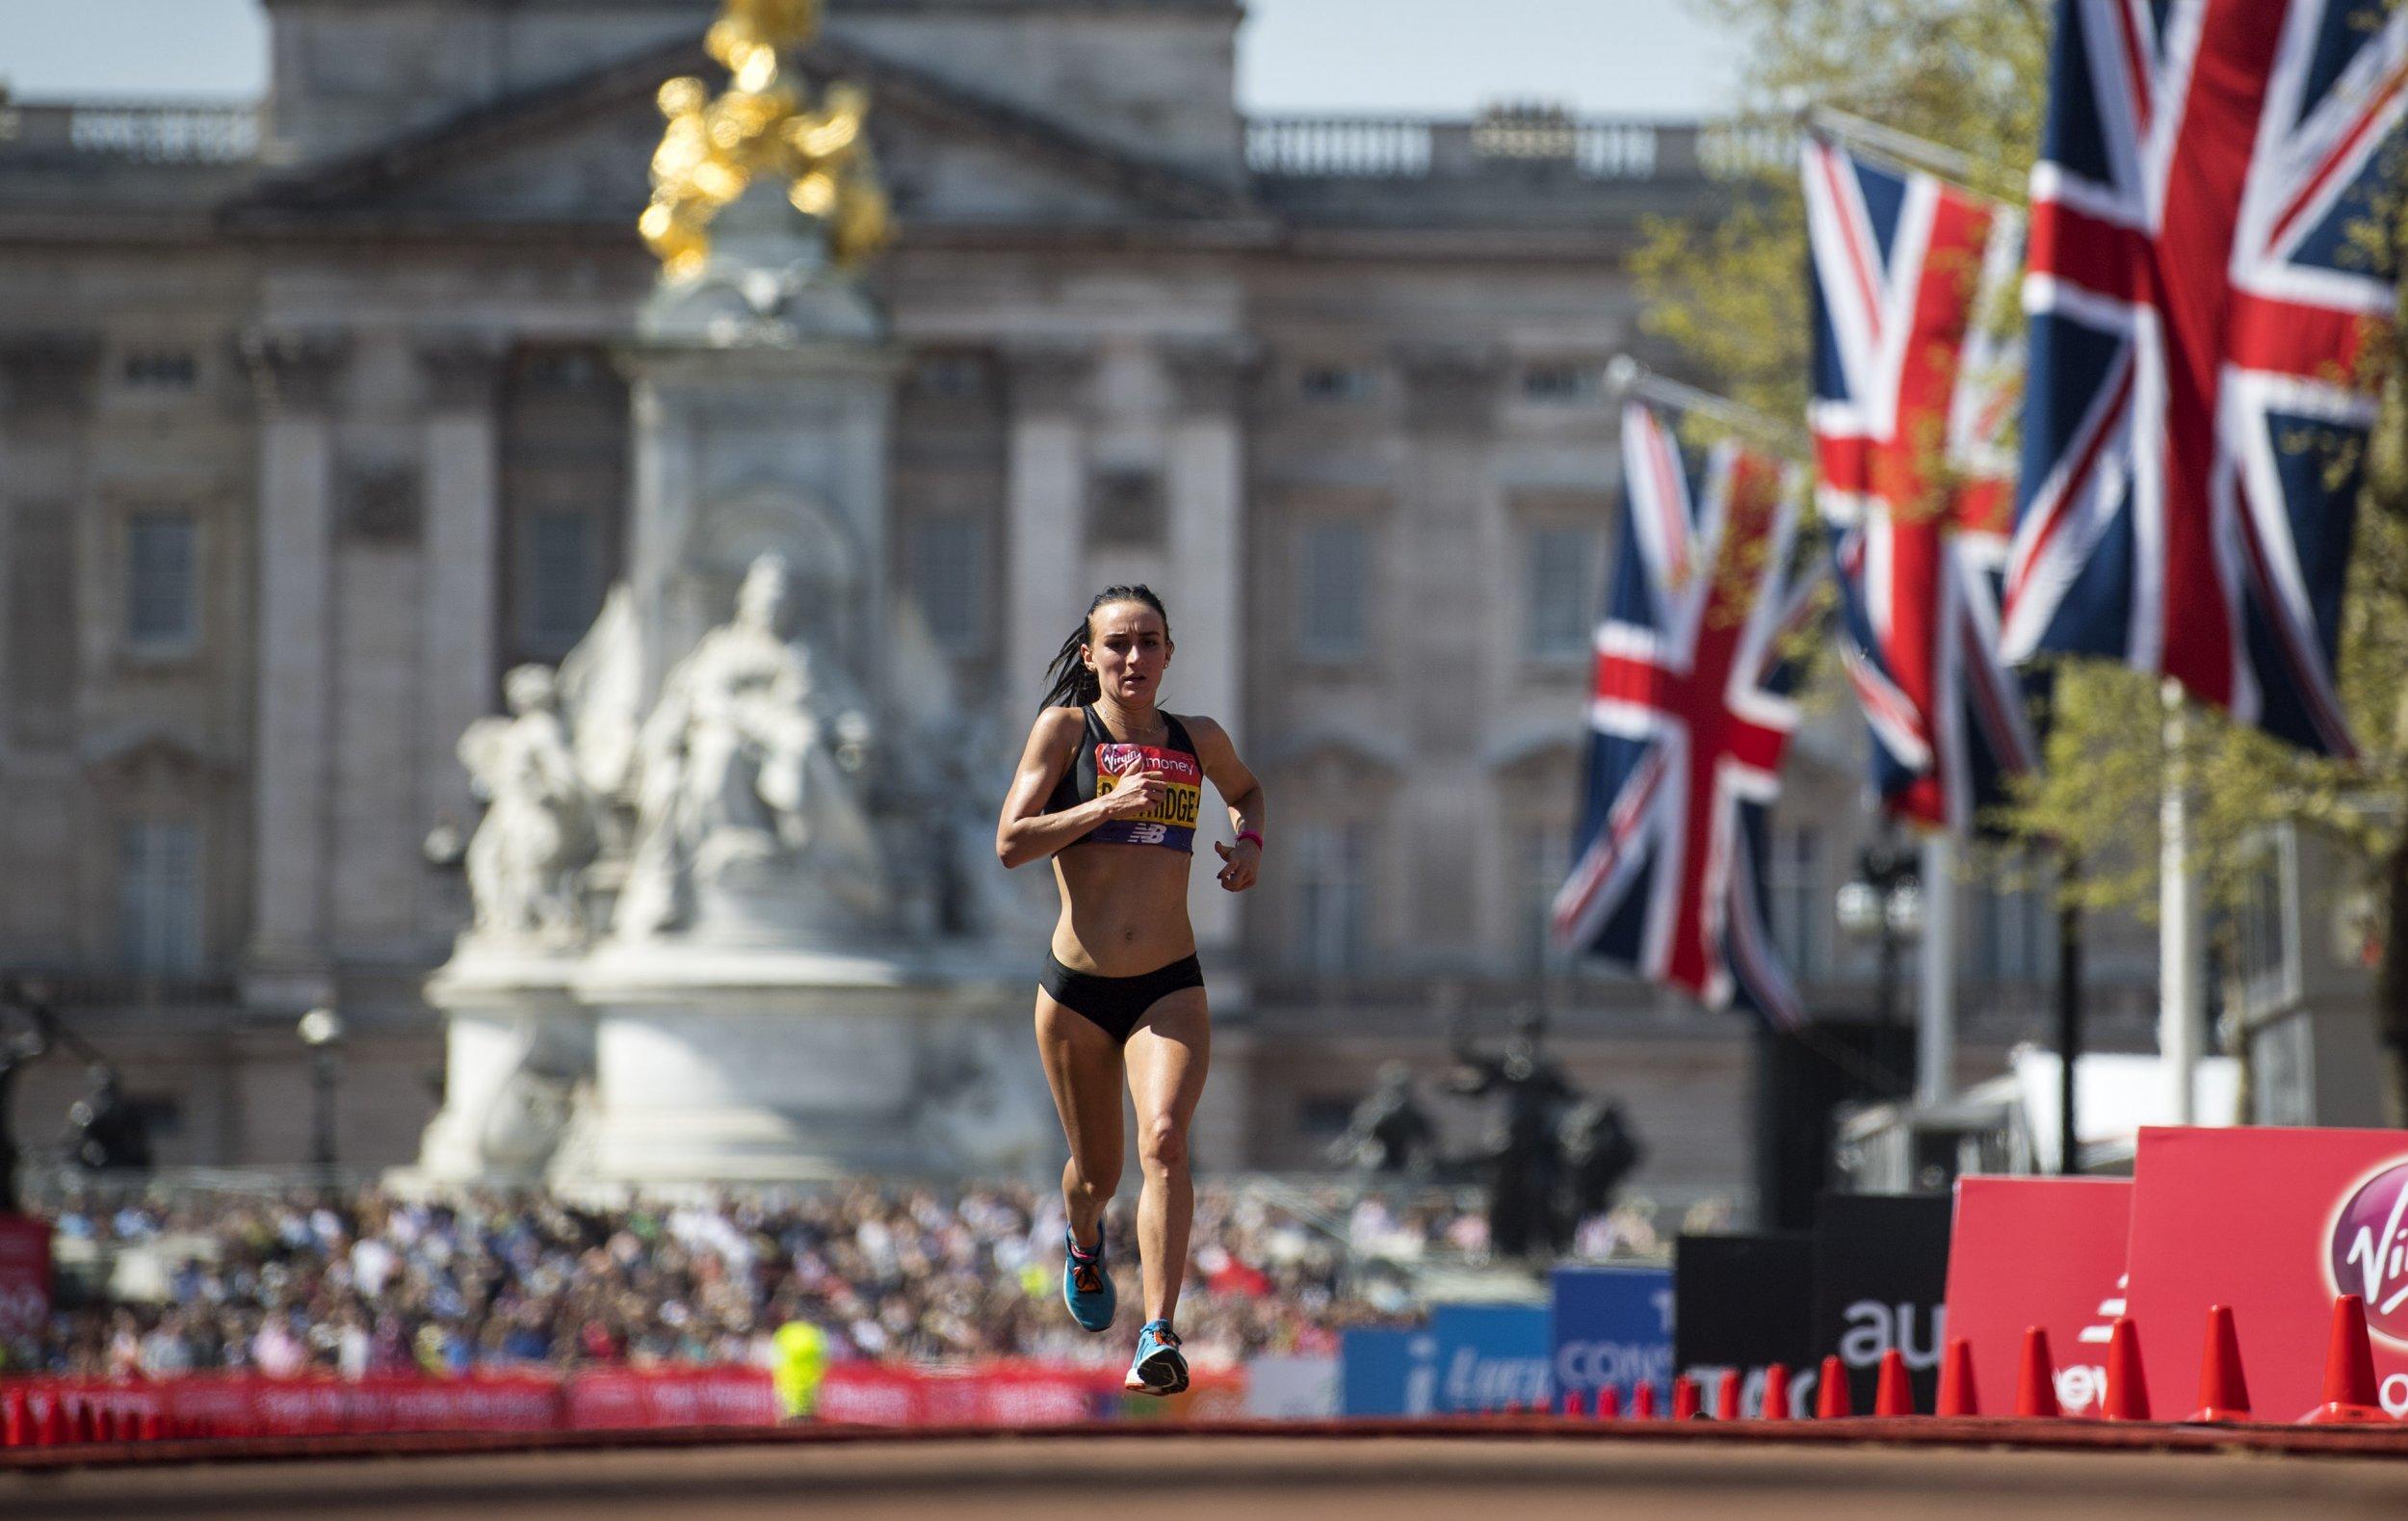 02f52eddbd London Marathon 2019: How To Watch Live Stream, Start Time, Route ...